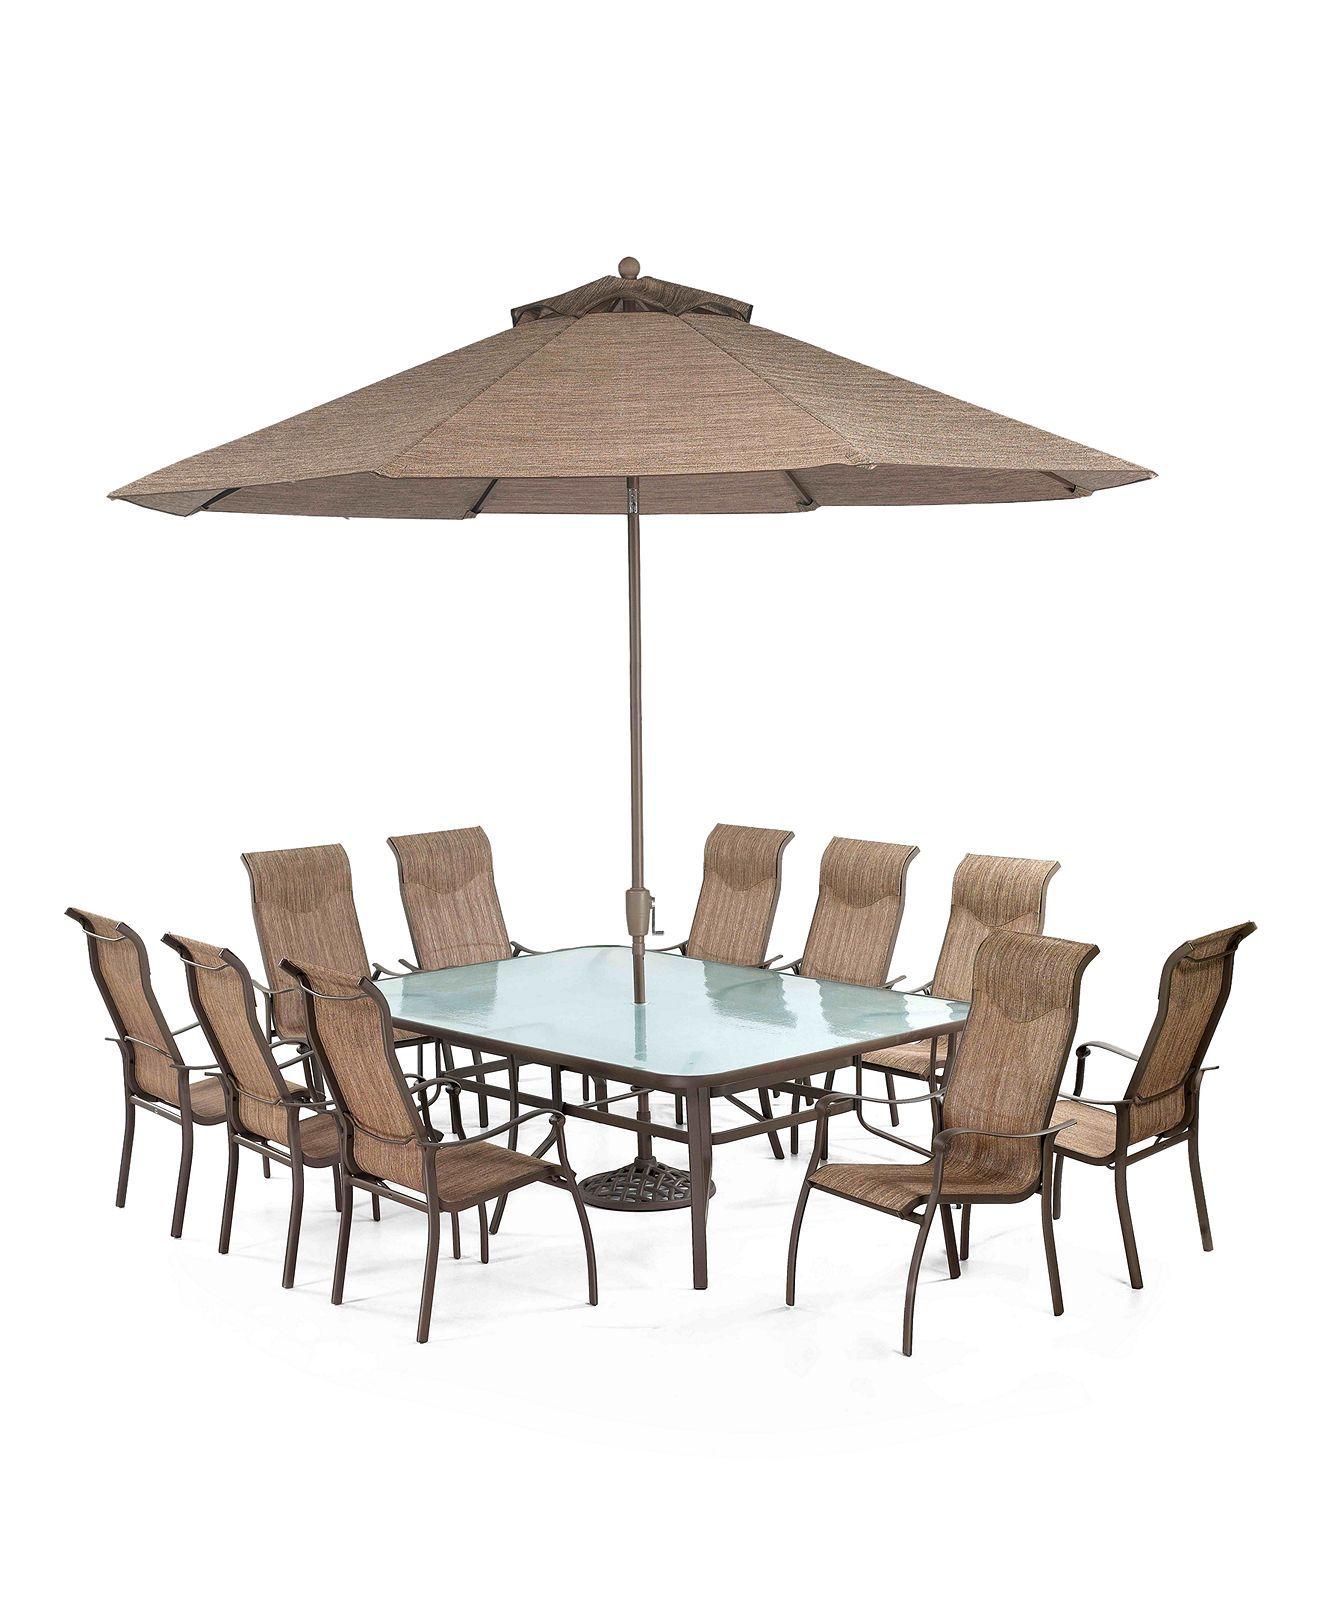 Oasis Outdoor Patio Furniture 14 Piece Set 84 Quot X 60